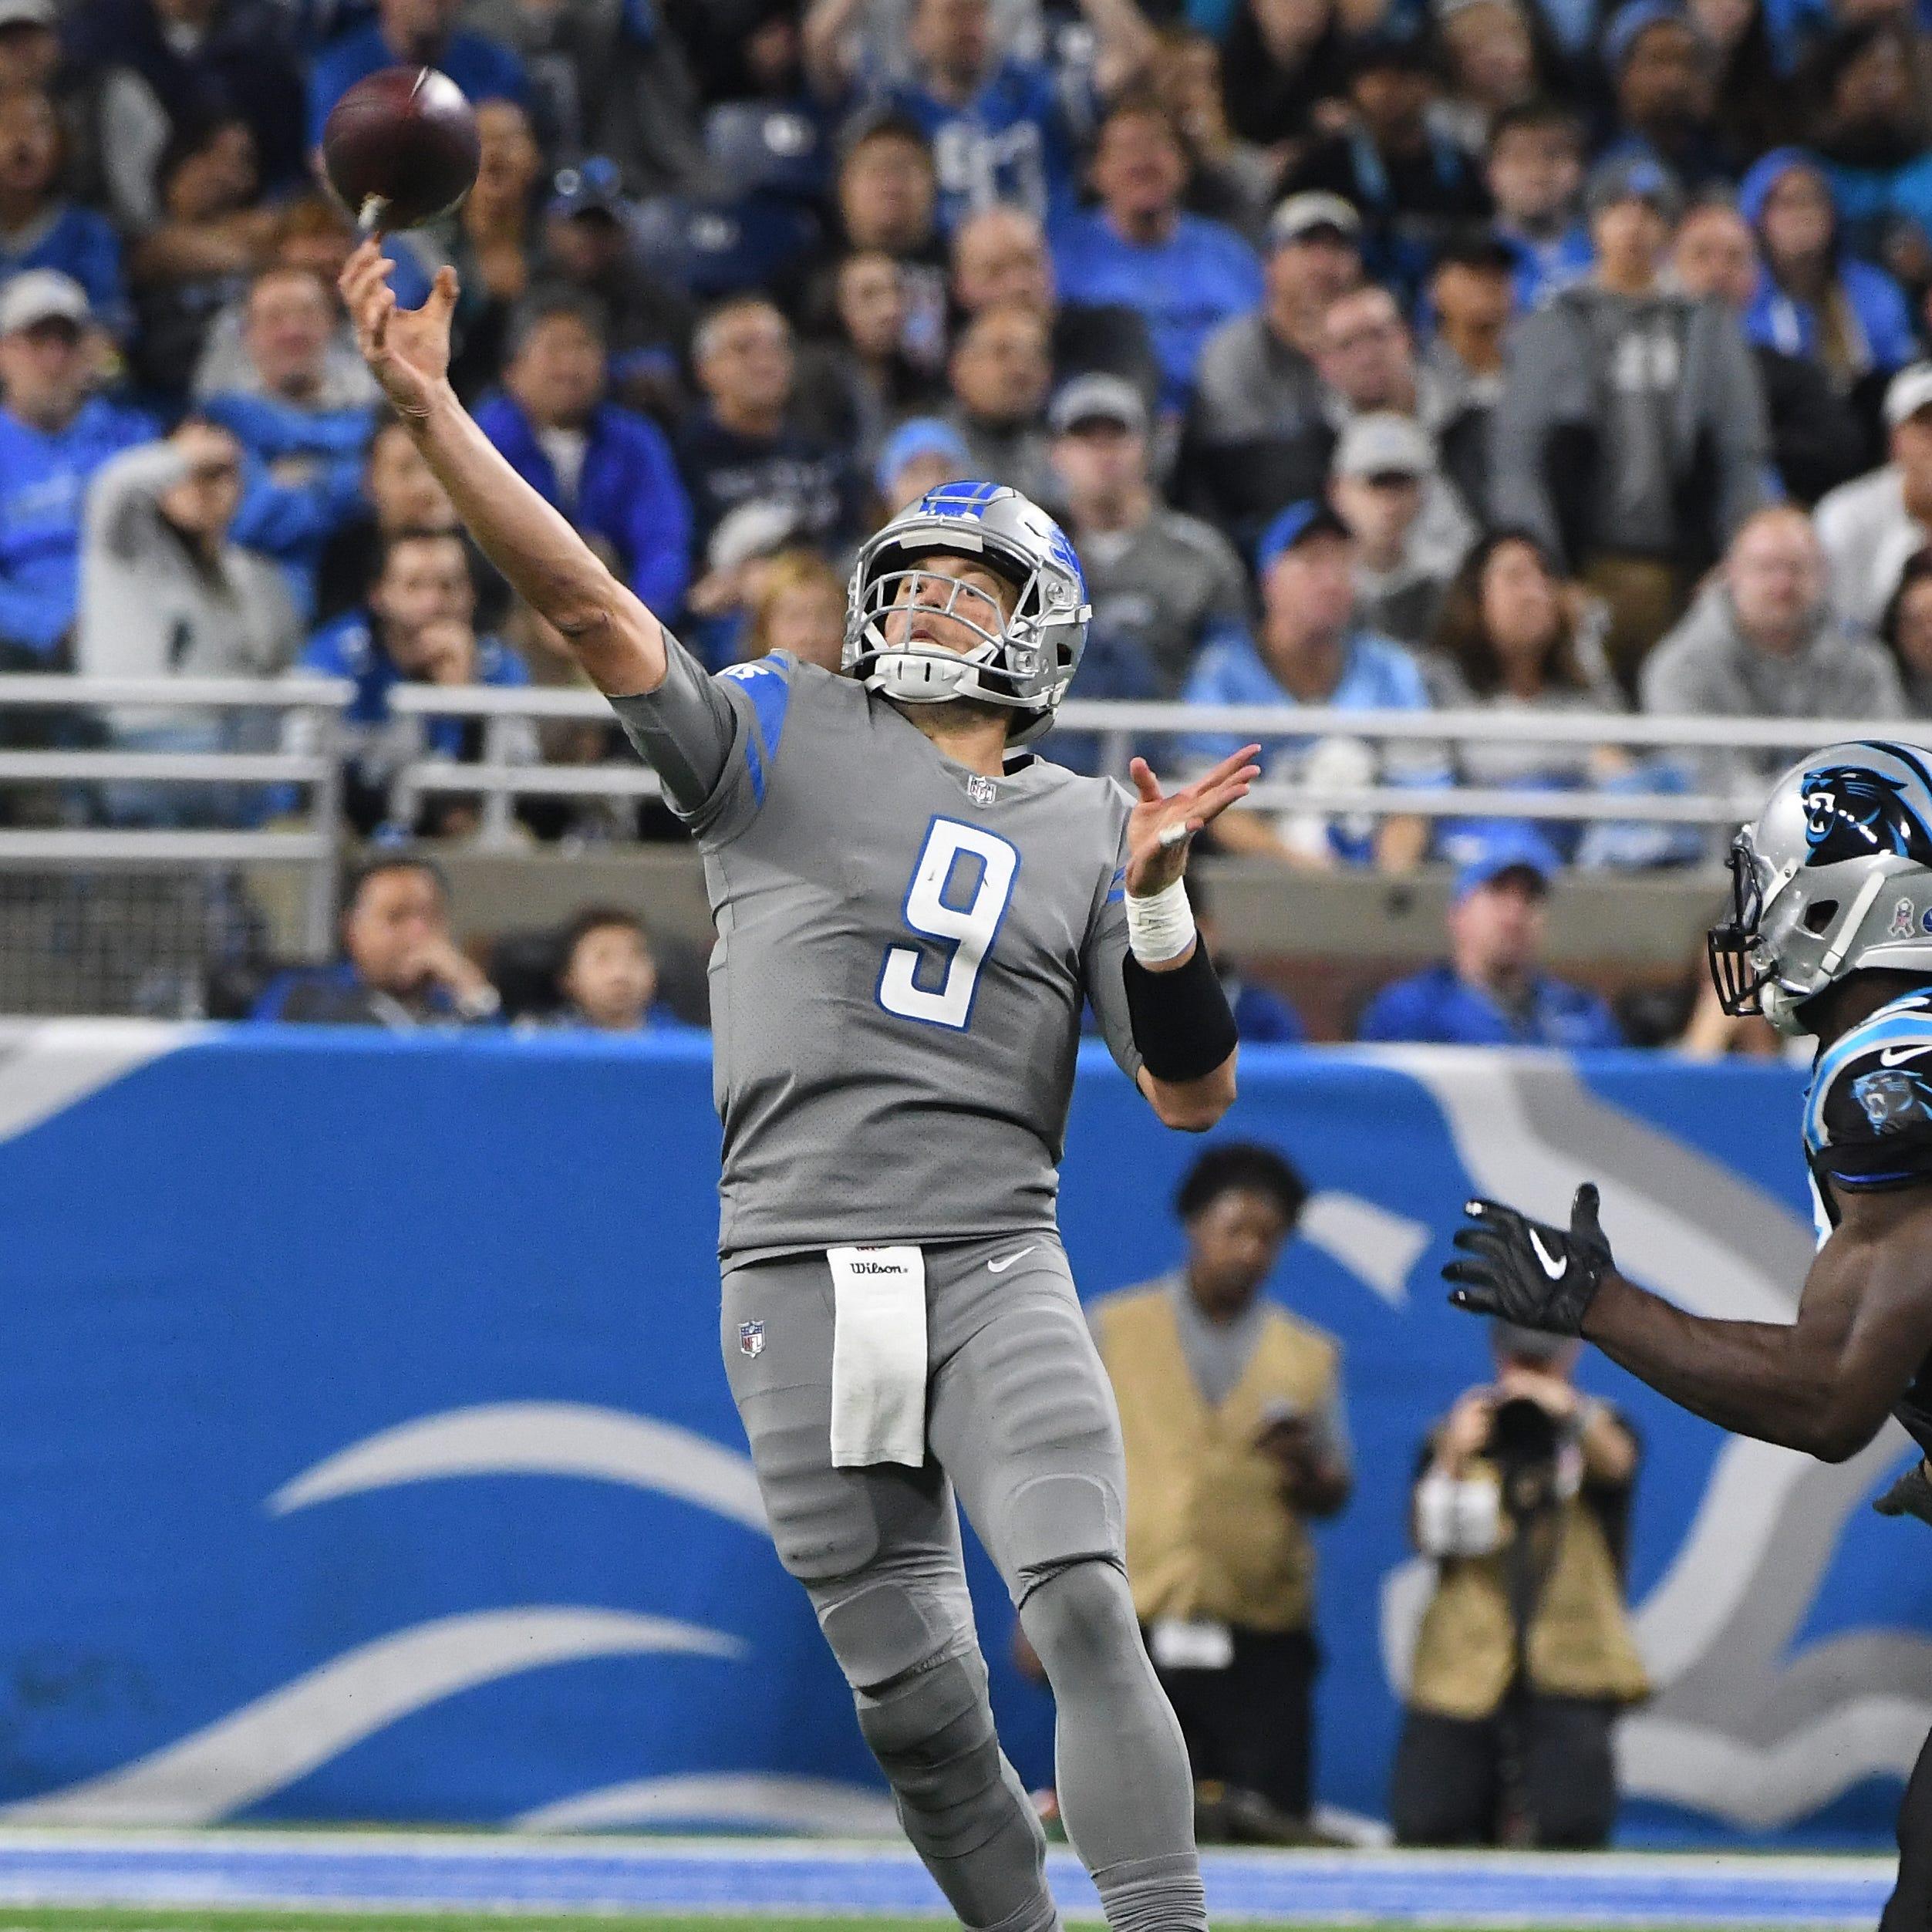 Justin Rogers' Lions grades: Performance vs. Carolina worthy of honor roll